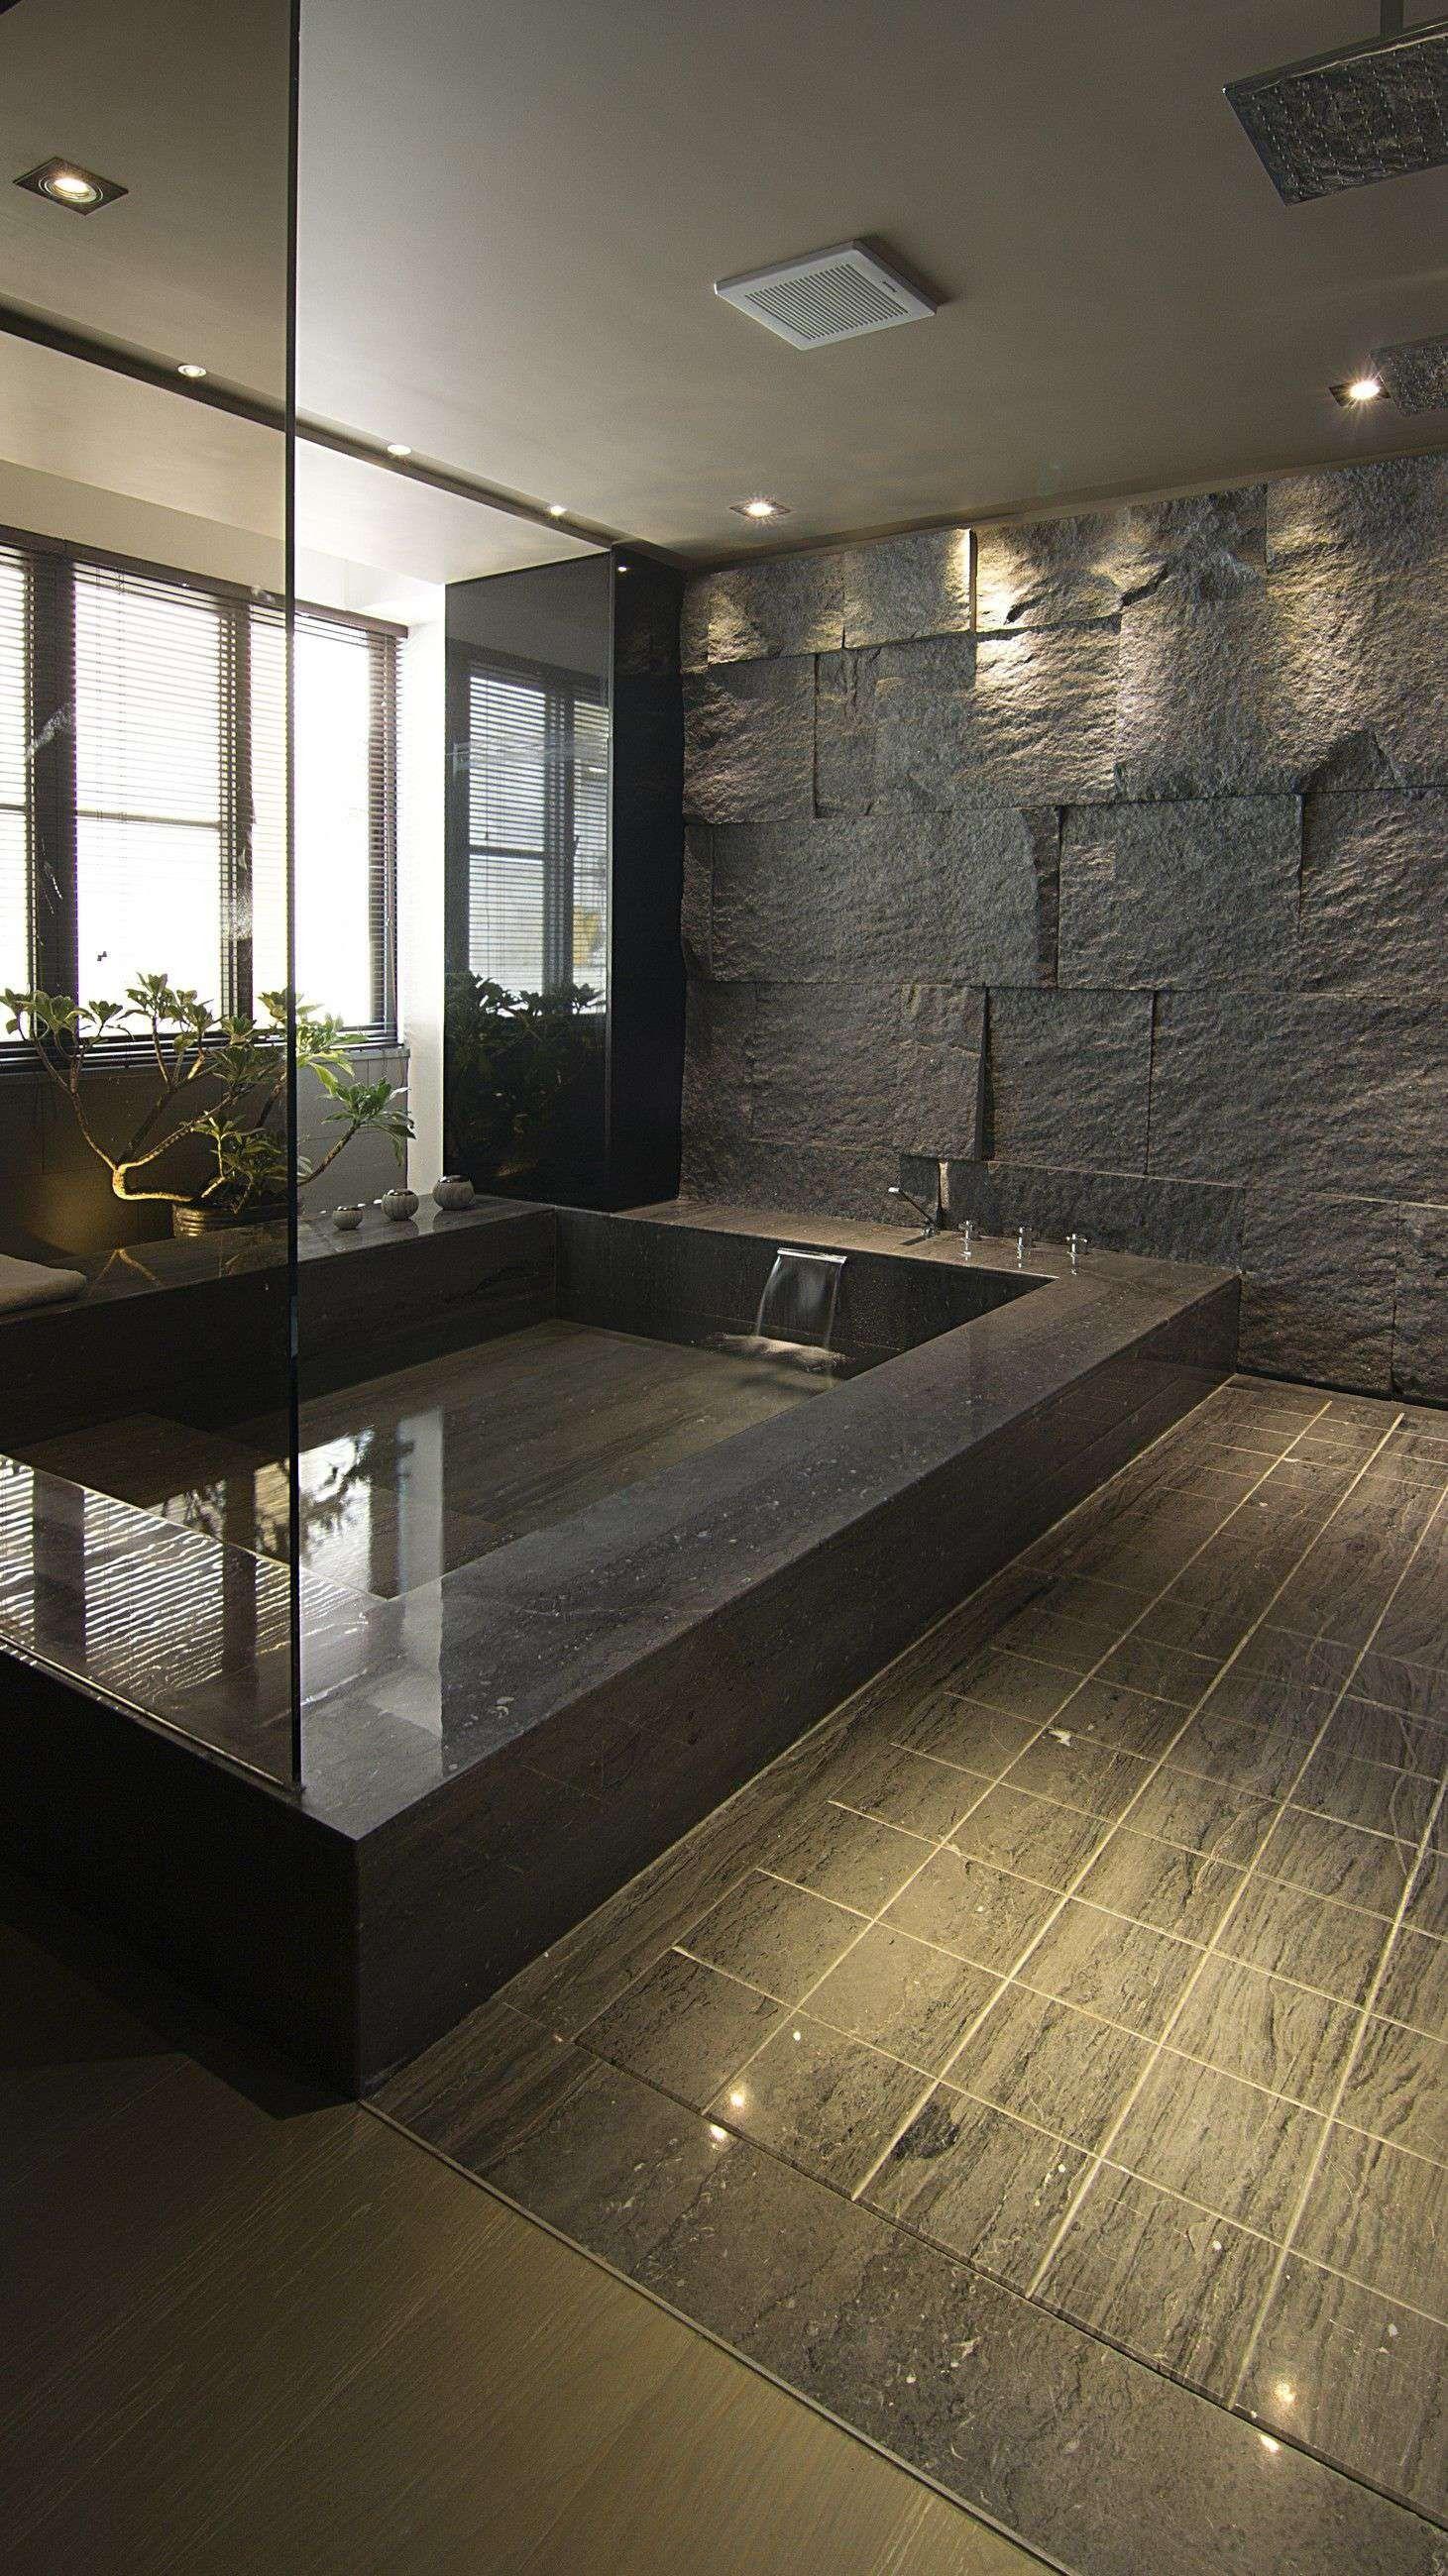 33 Wondrous Japanese Bathroom Ideas Dream Bathrooms Japanese